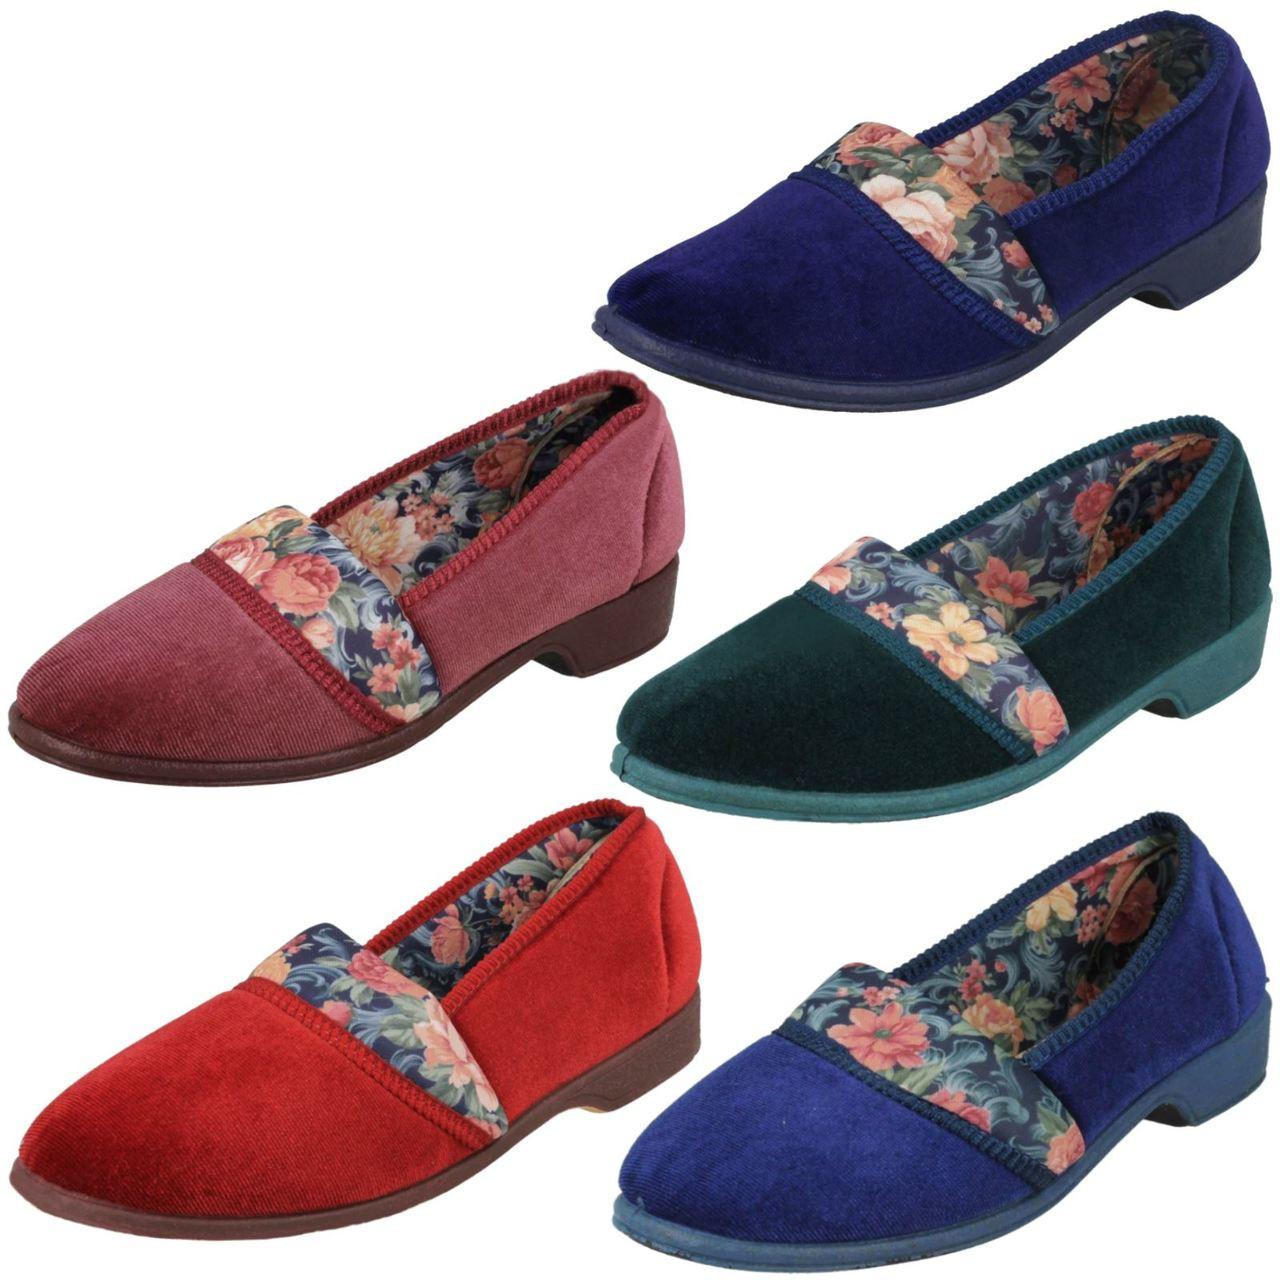 Ladylove Ladies Floral Design Slippers